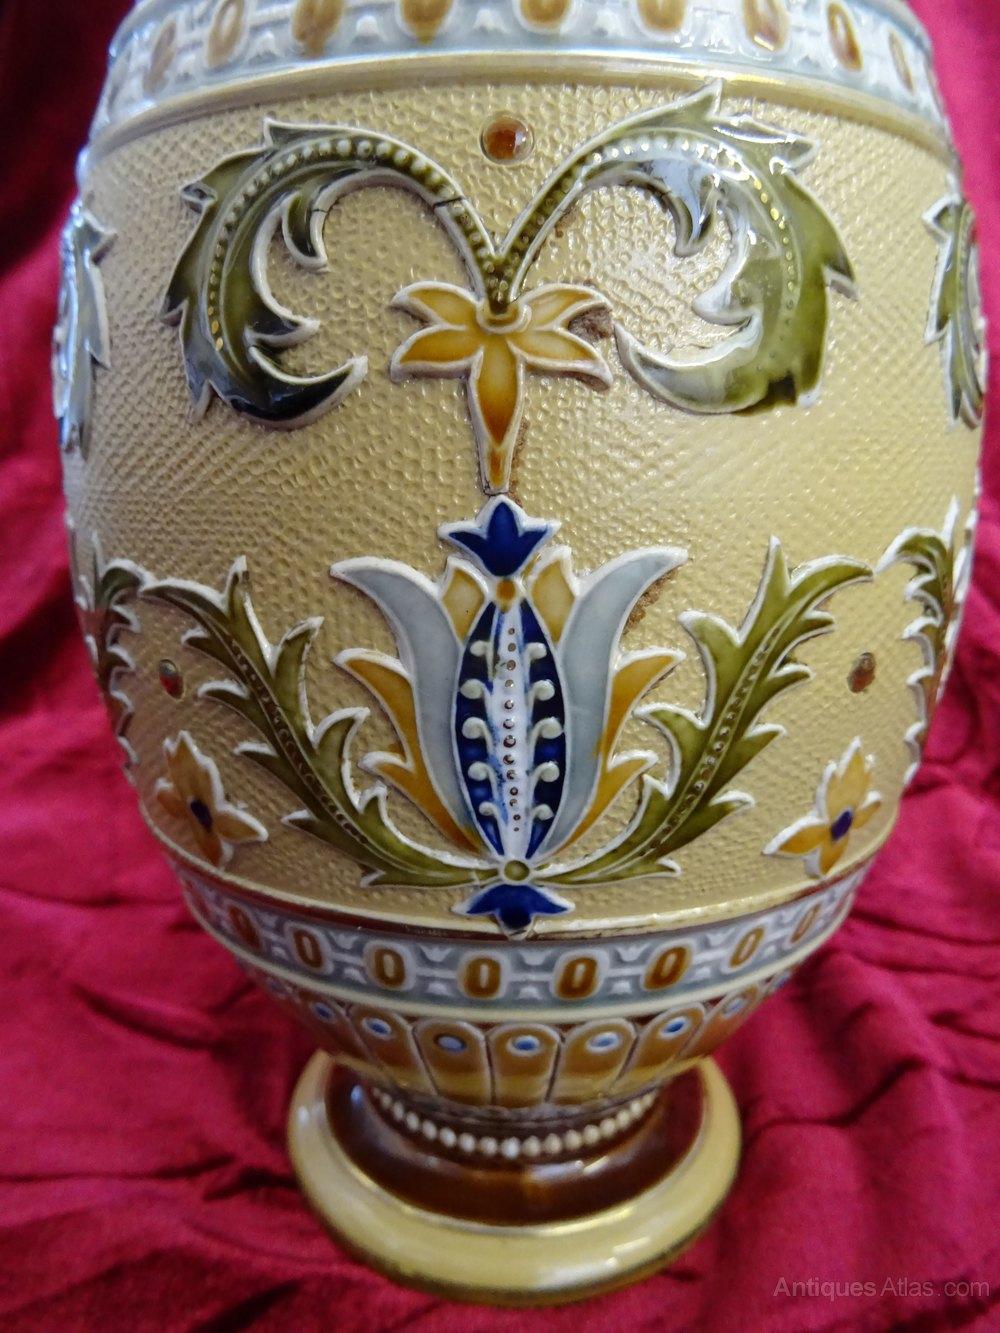 Antiques atlas late victorian villeroy boch mettlach vase late victorian villeroy boch mettlach vase antique ceramics victorian german reviewsmspy